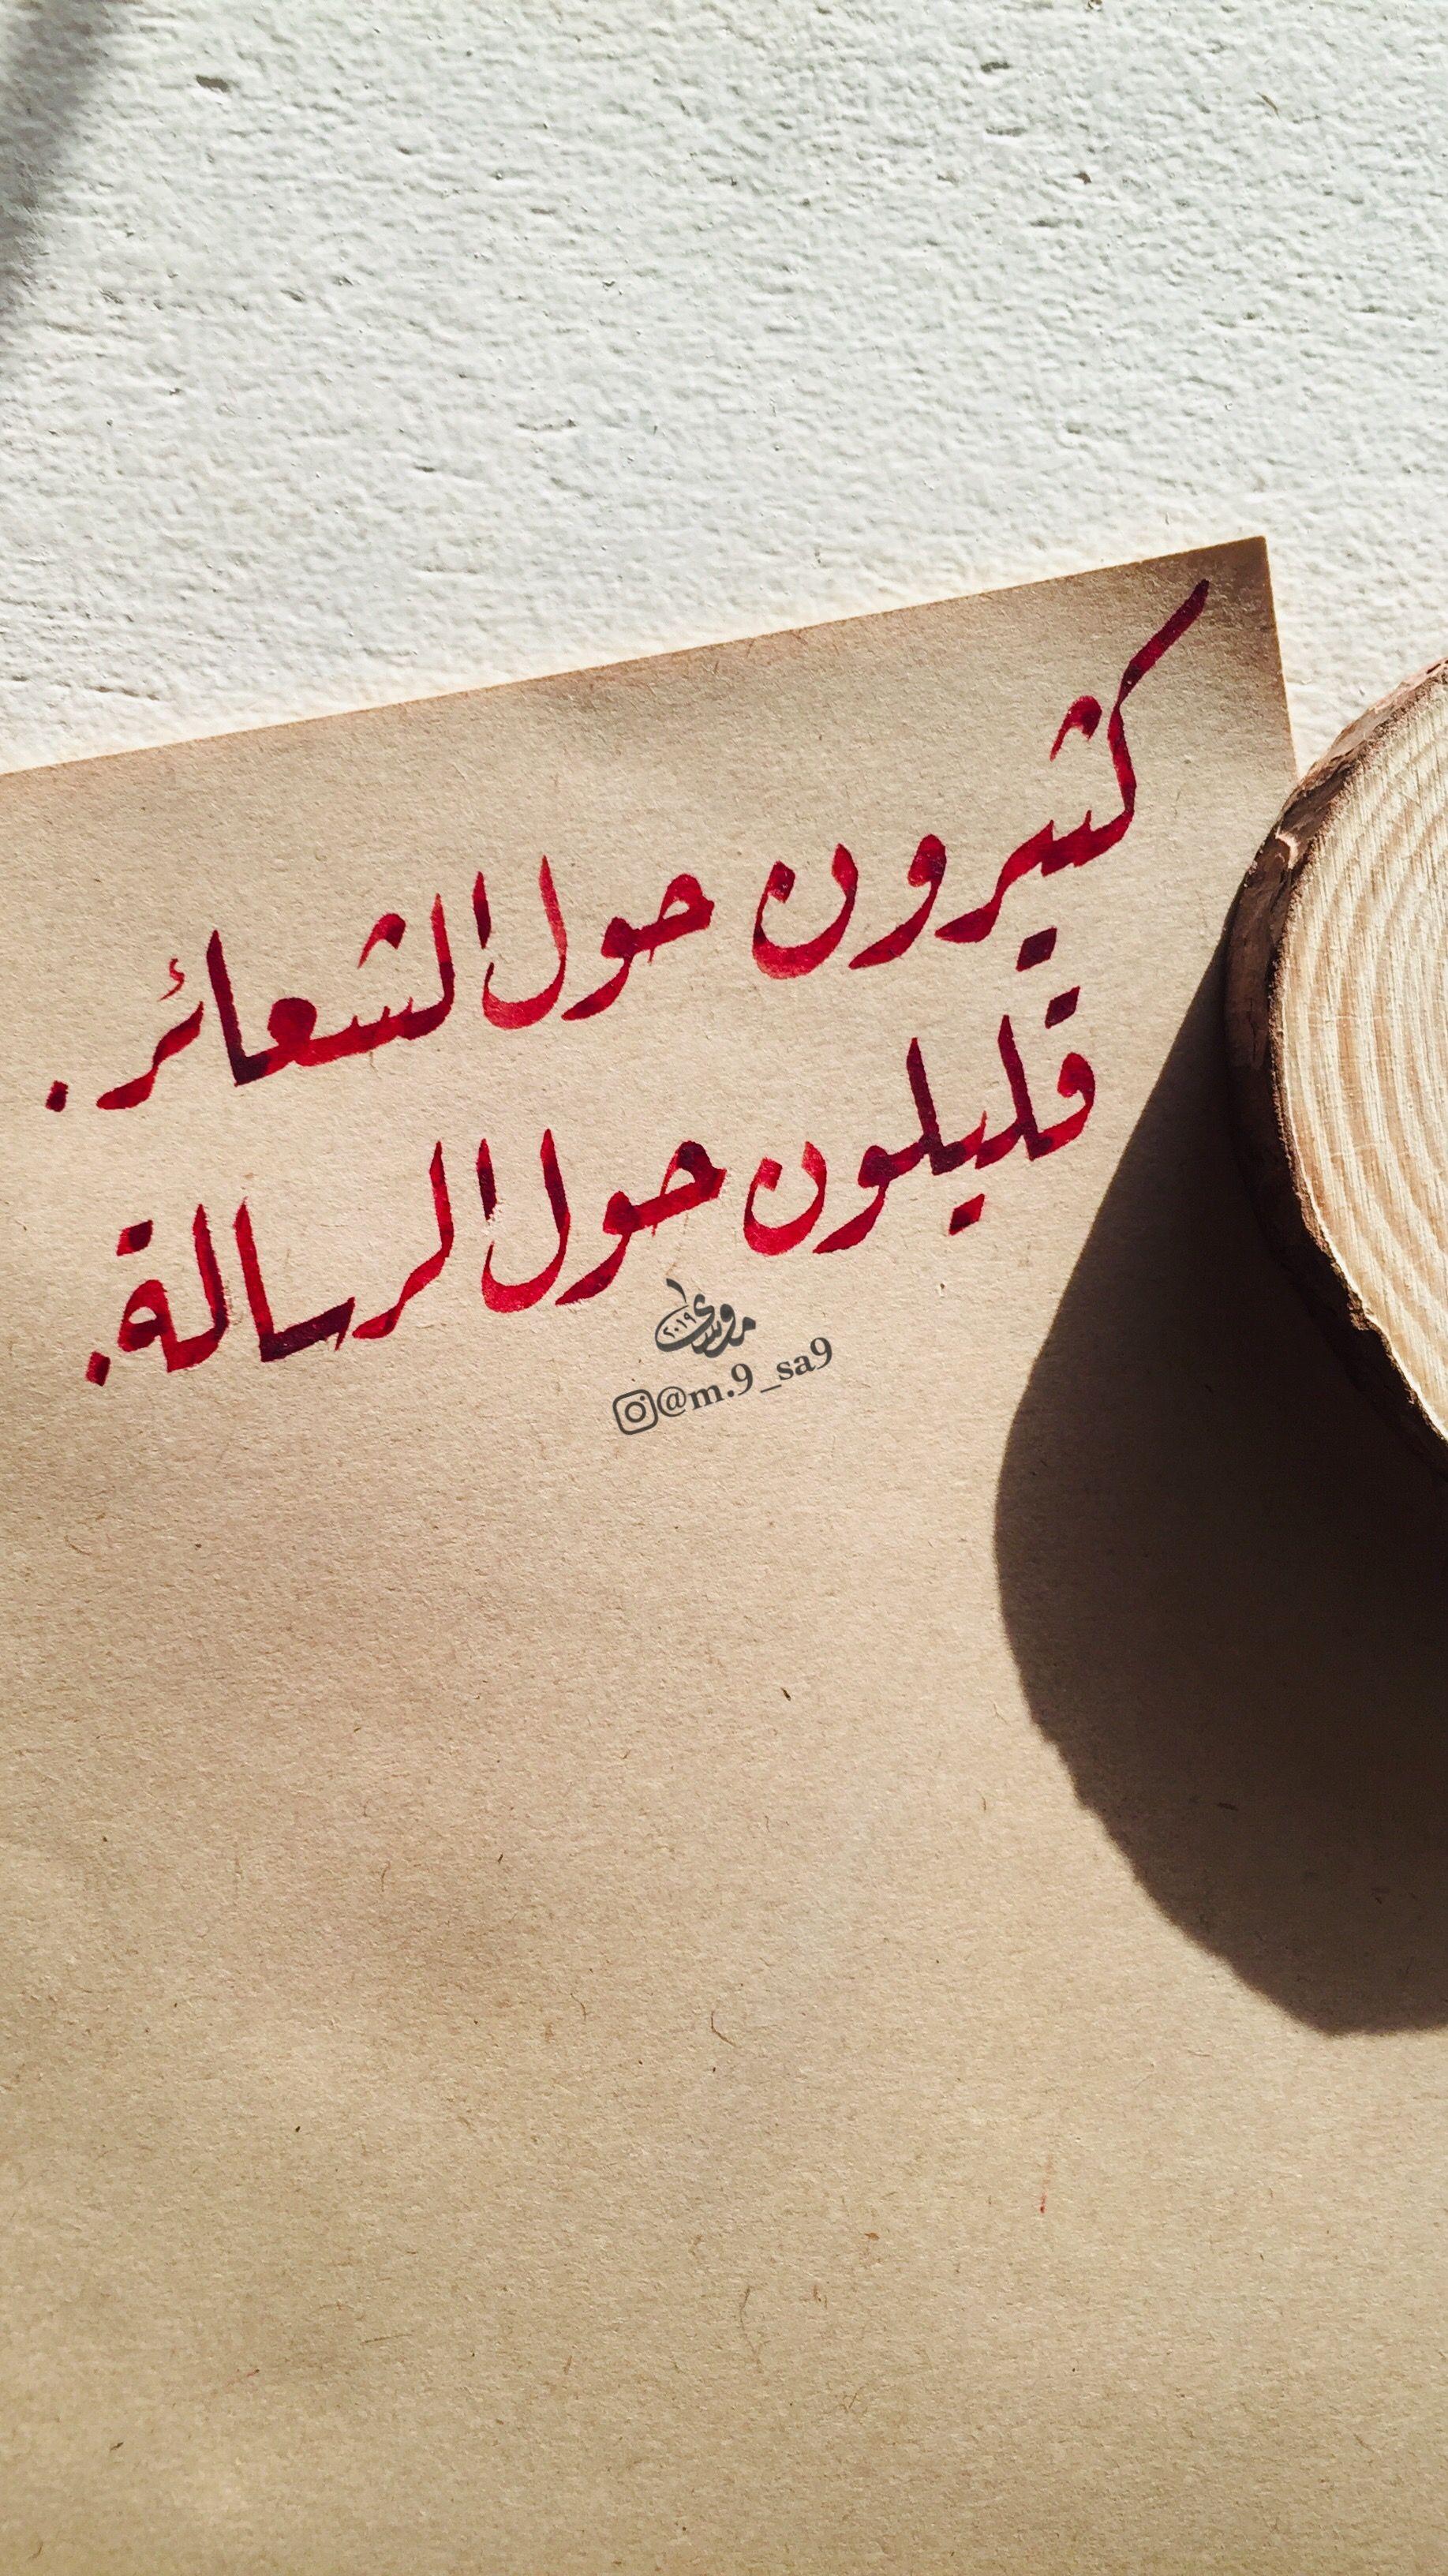 Calligraphy Lifequotes Calligraphyart Art اقوال Artwork Quotes حكم Arabiccalligraphy Poetryquotes ر Wisdom Quotes Life Arabic Quotes Words Quotes